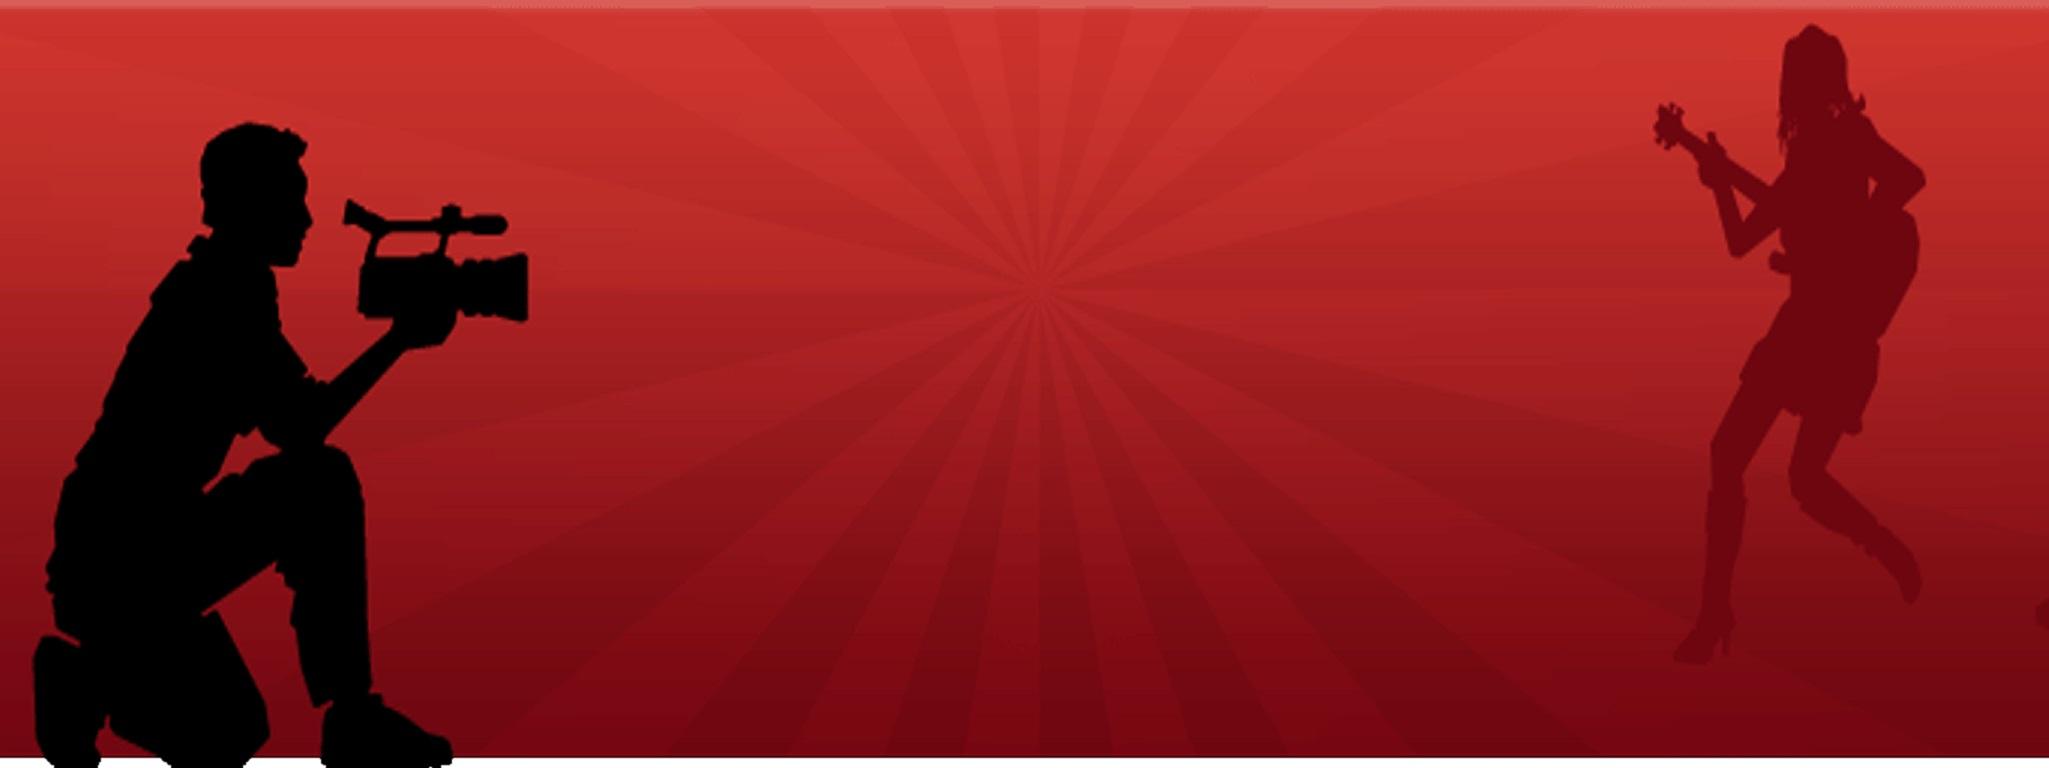 marketplacevideoshare